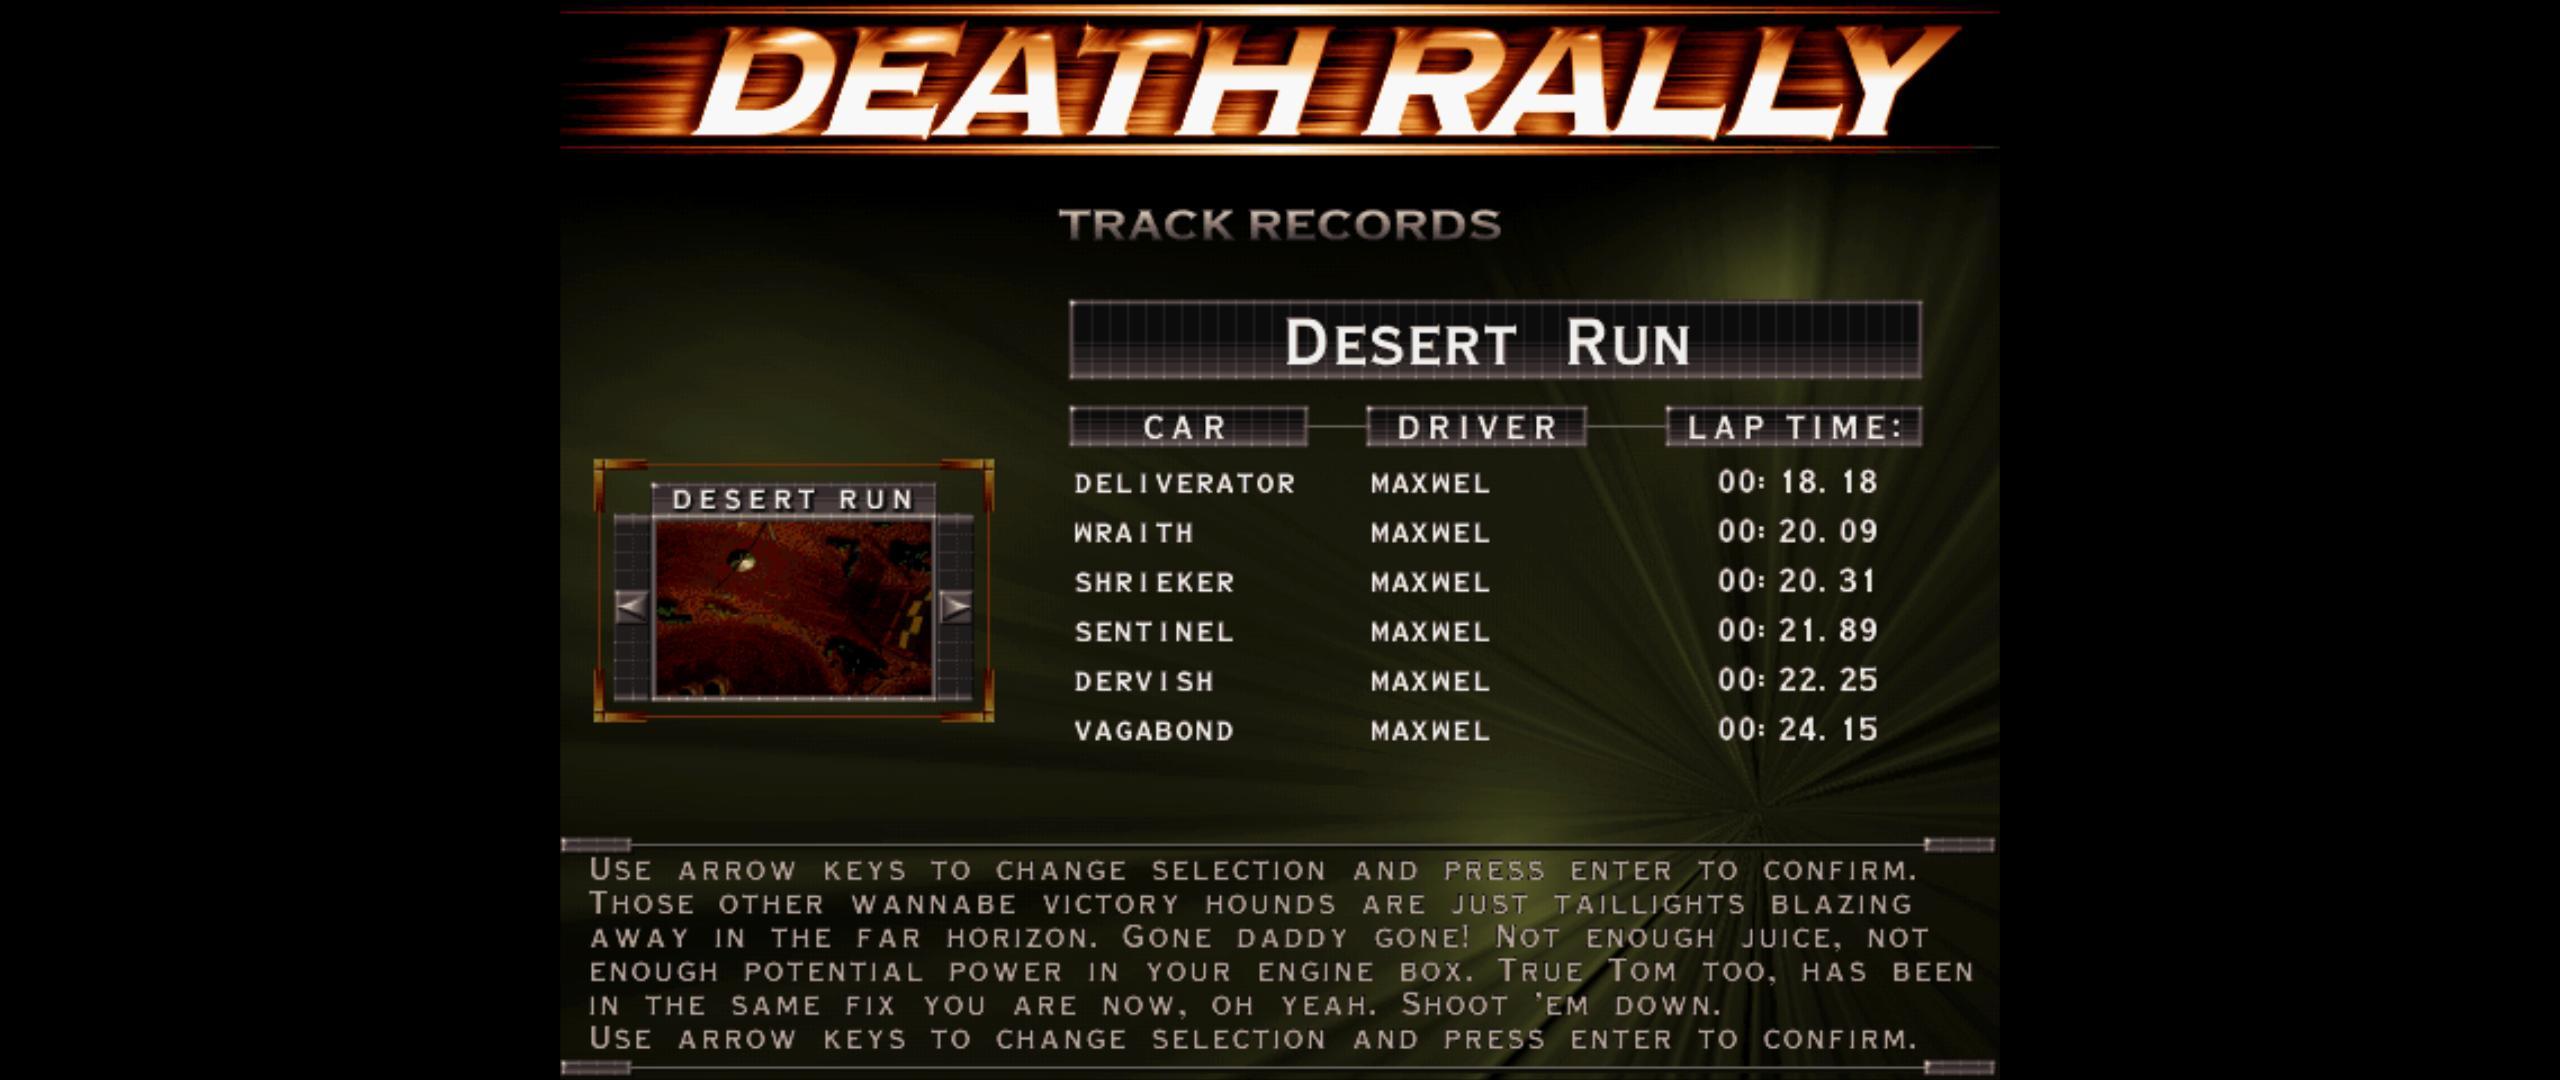 Maxwel: Death Rally [Desert Run, Sentinel Car] (PC) 0:00:21.89 points on 2016-03-04 06:58:00